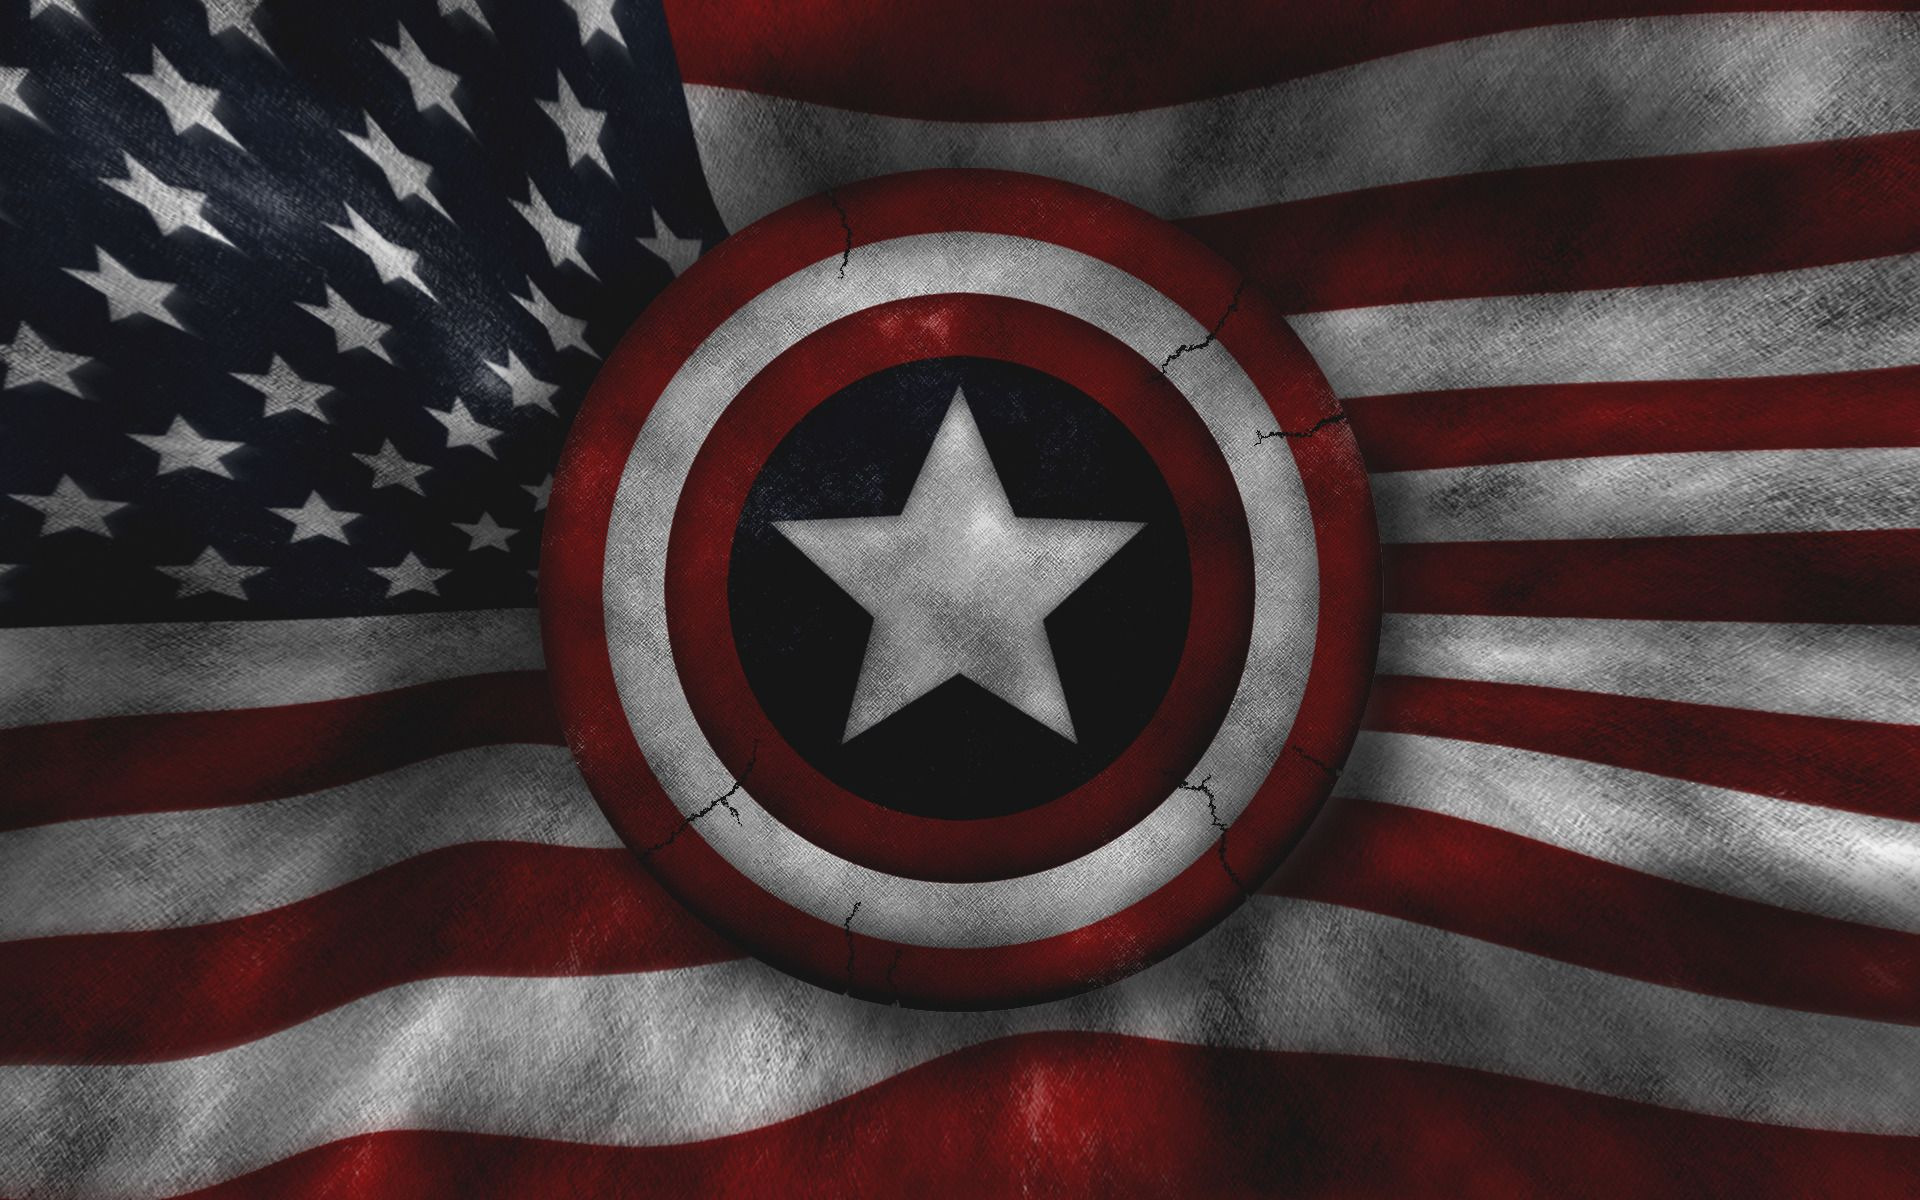 Captain America Captain America Wallpaper Captain America Shield Wallpaper Captain America Shield